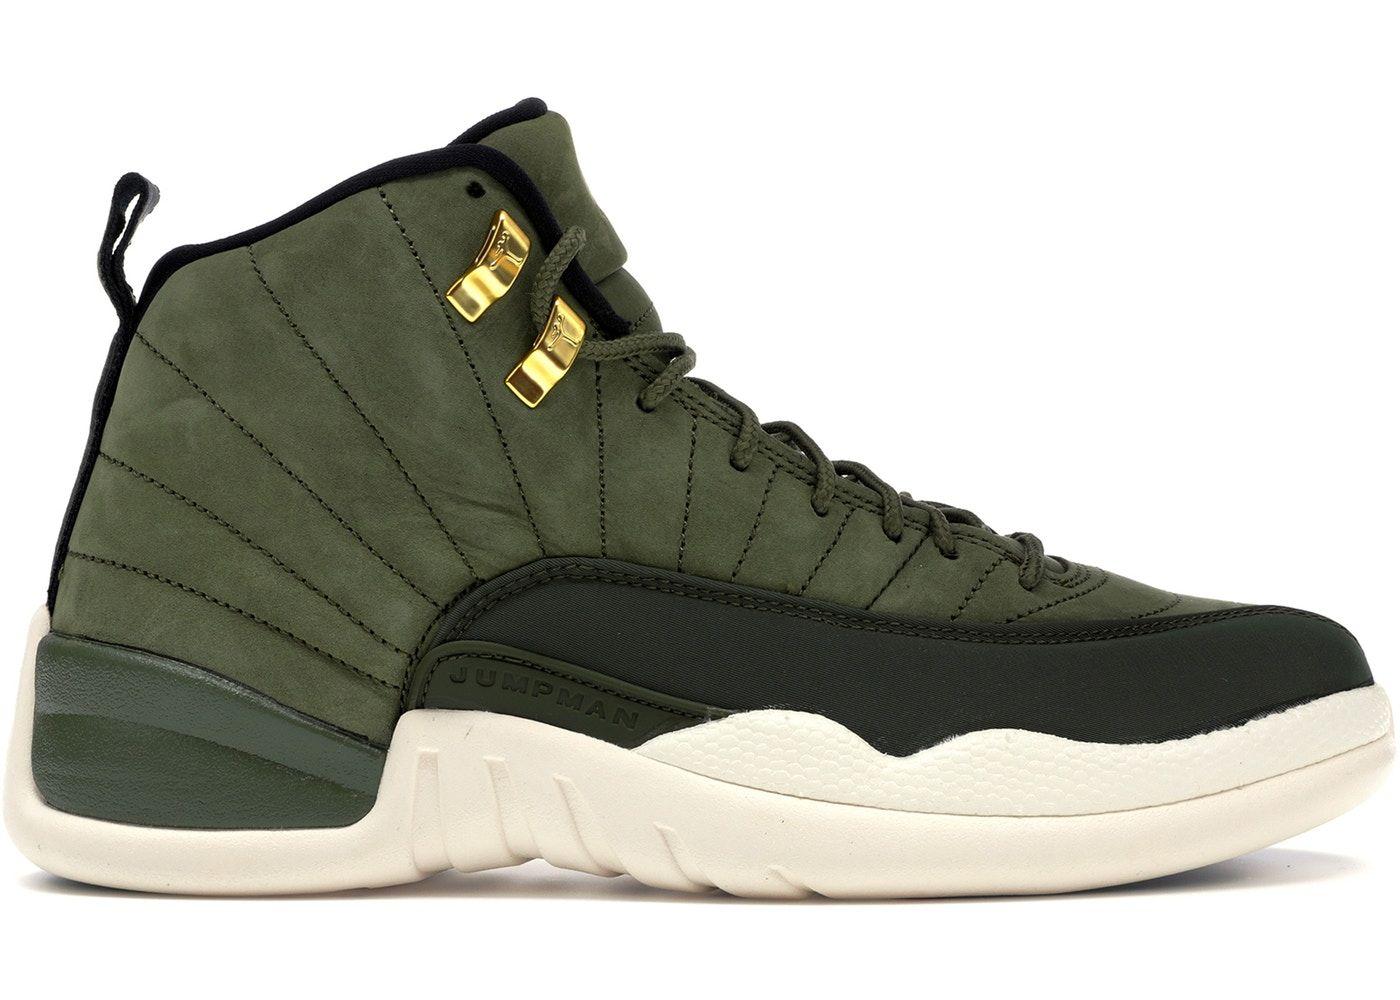 Jordan 12 Retro Chris Paul Class Of 2003 Sneakers